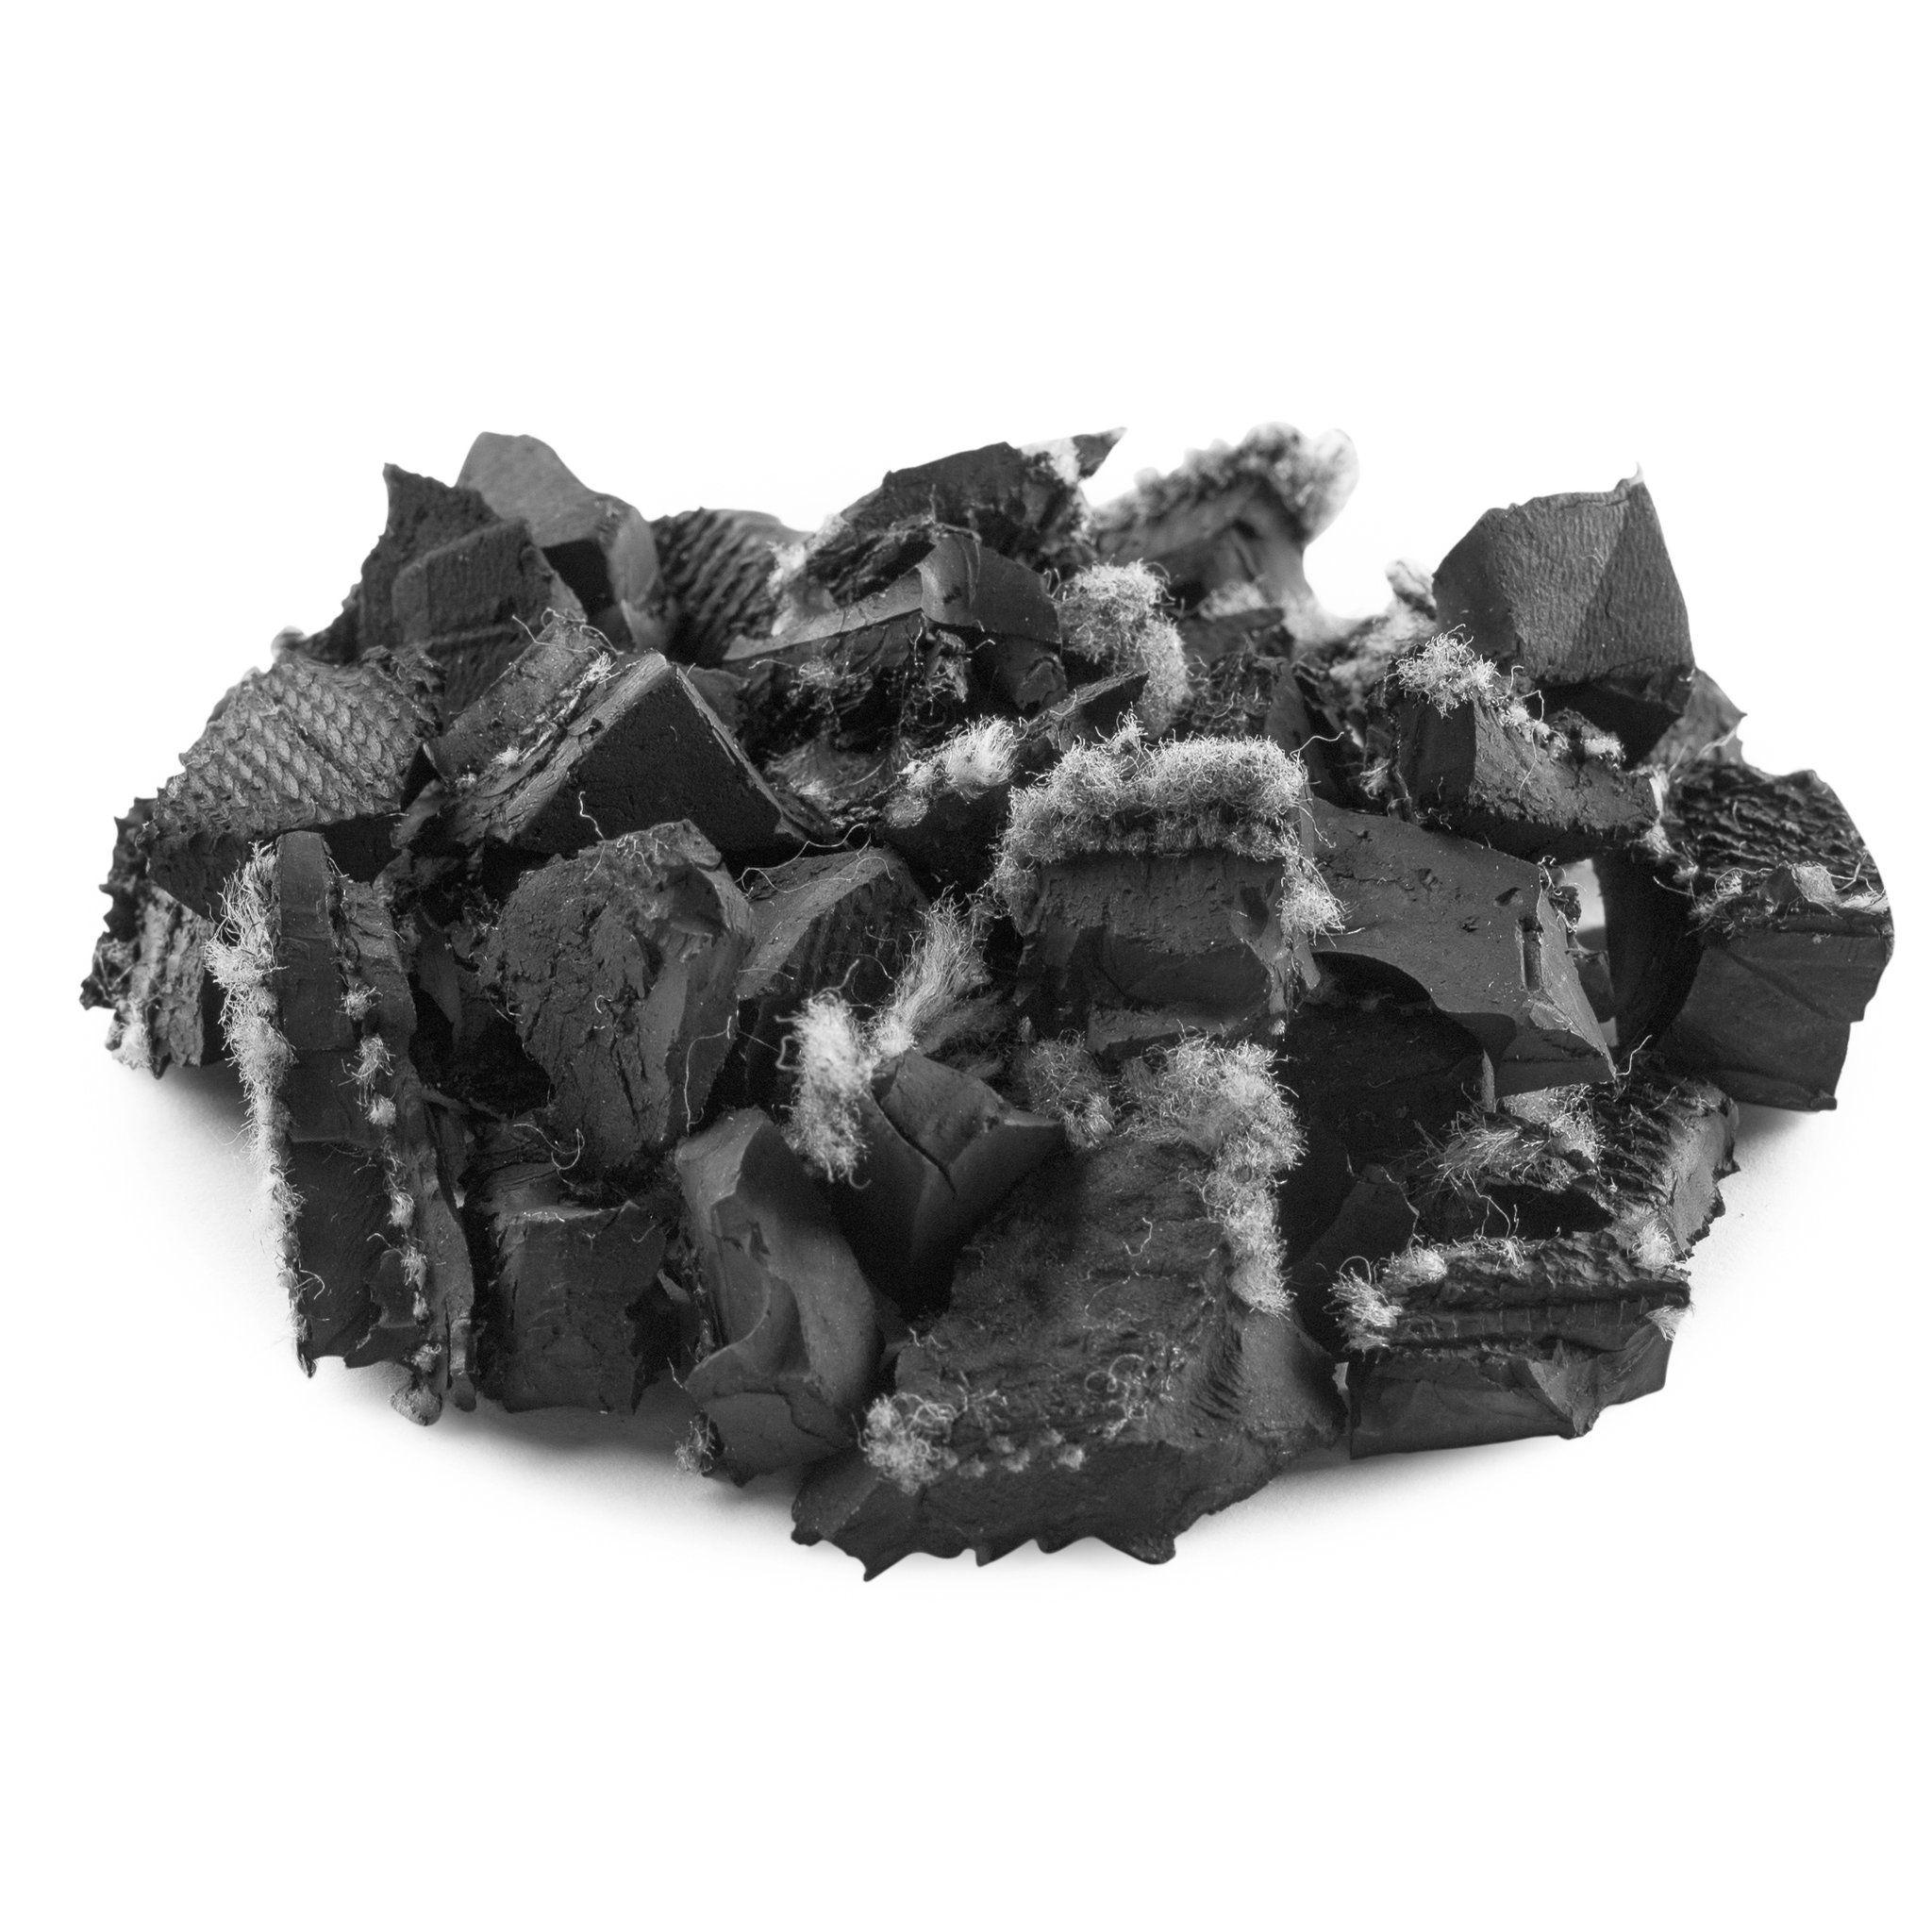 Playsafer rubber mulch unpainted black rubber mulch